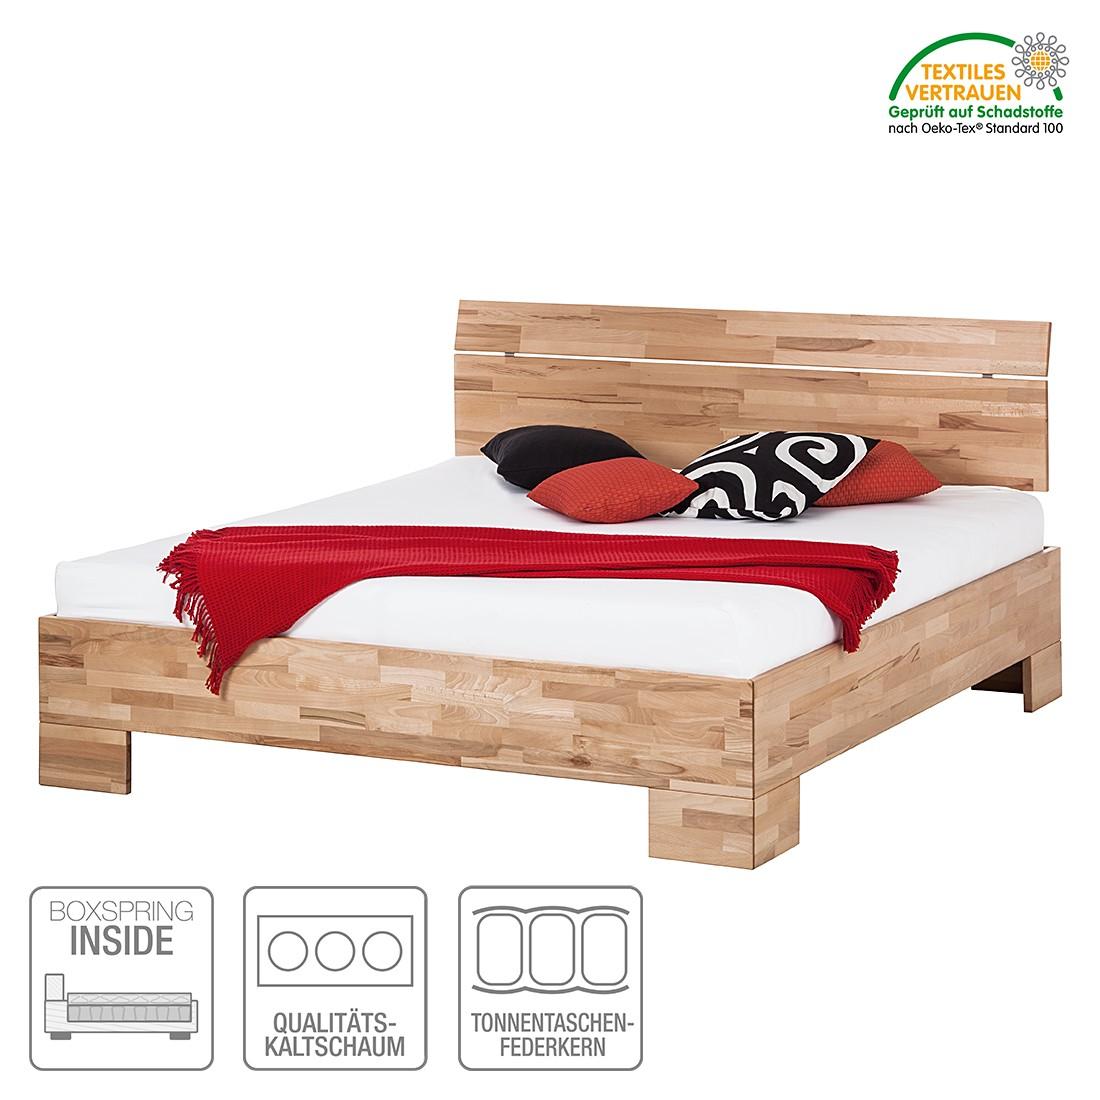 boxspring inside bett tirol ii kernbuche massiv ge lt. Black Bedroom Furniture Sets. Home Design Ideas